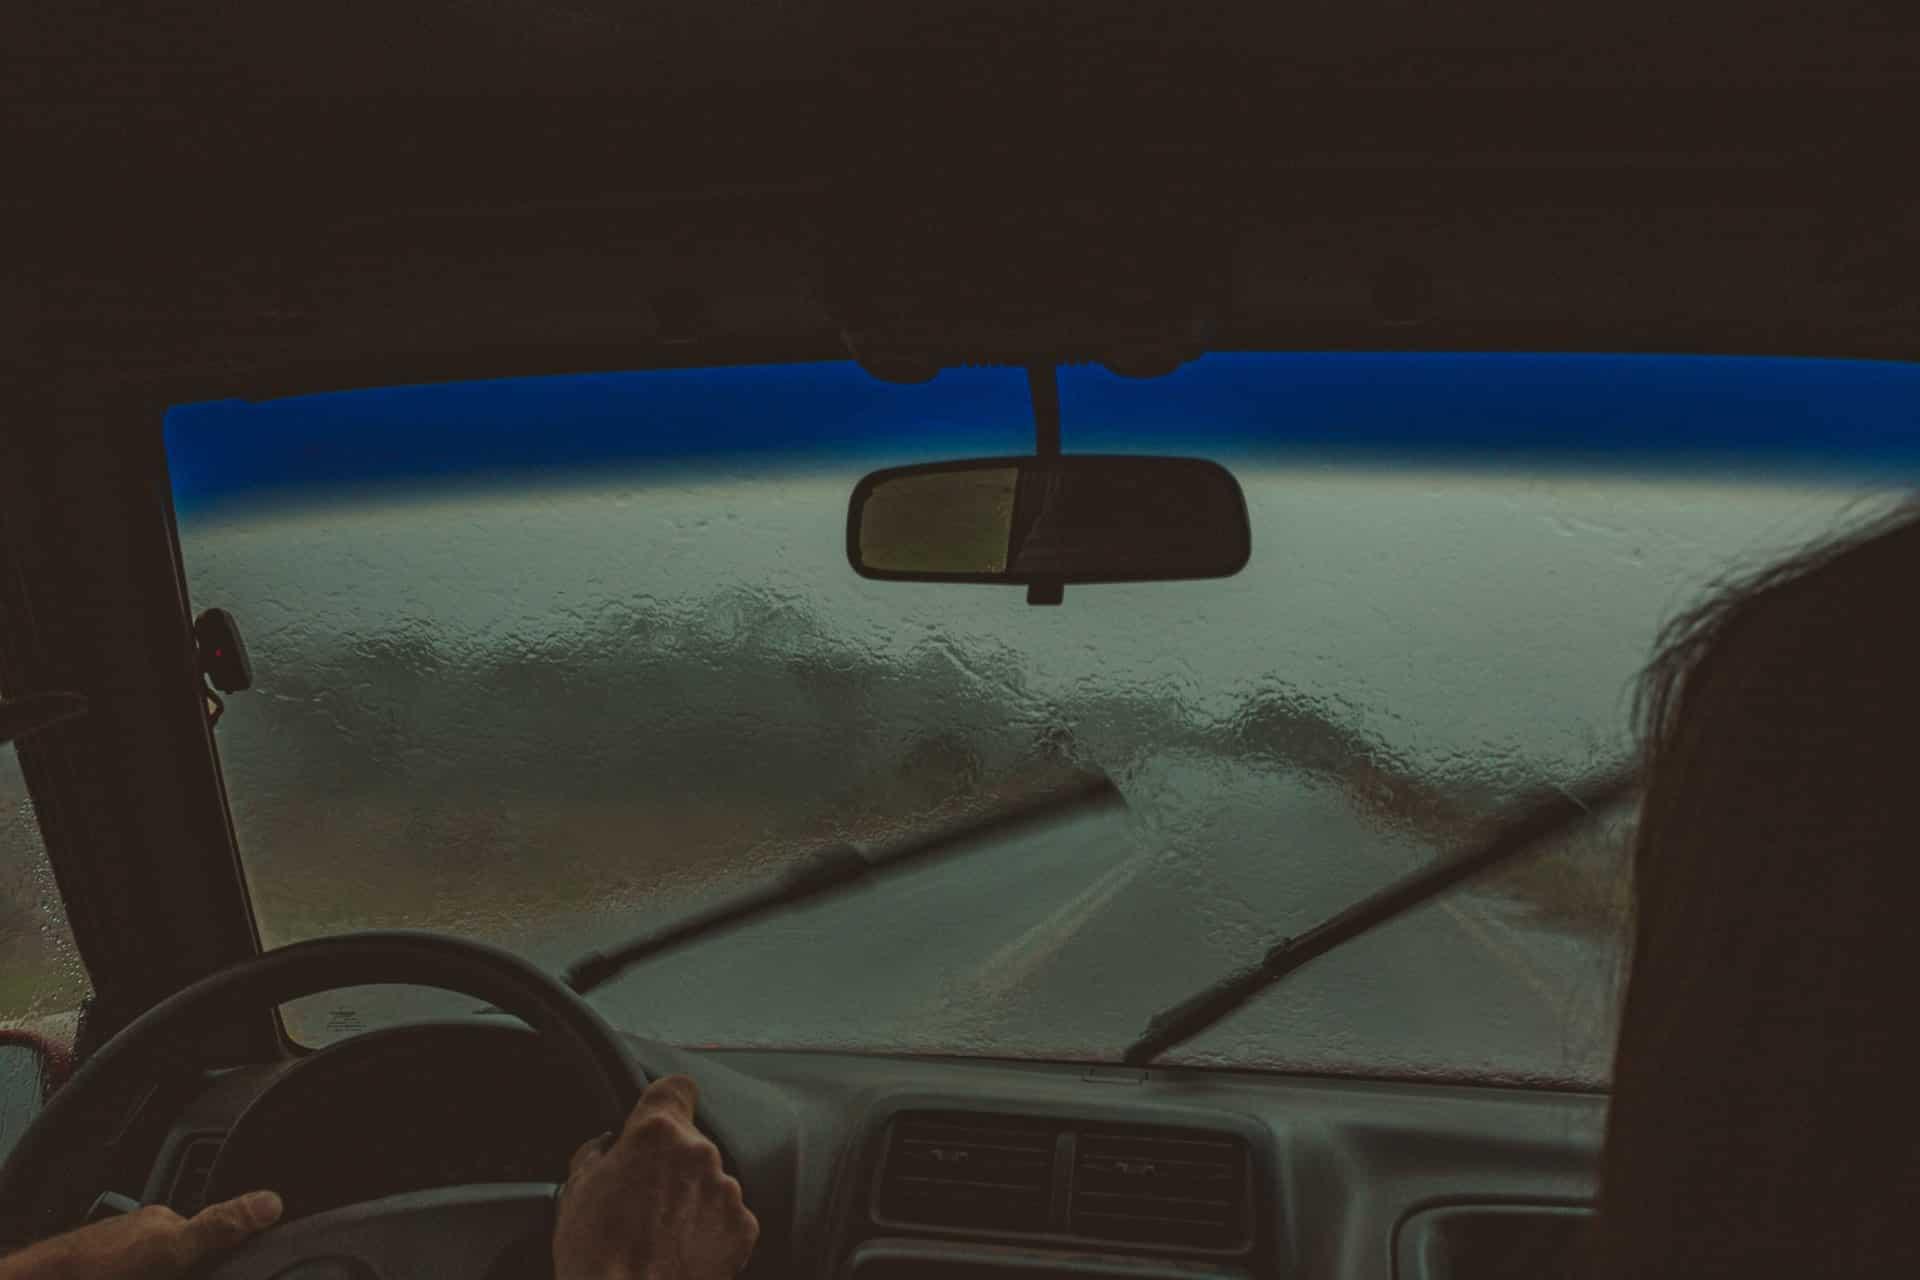 monsoon season driving dangers